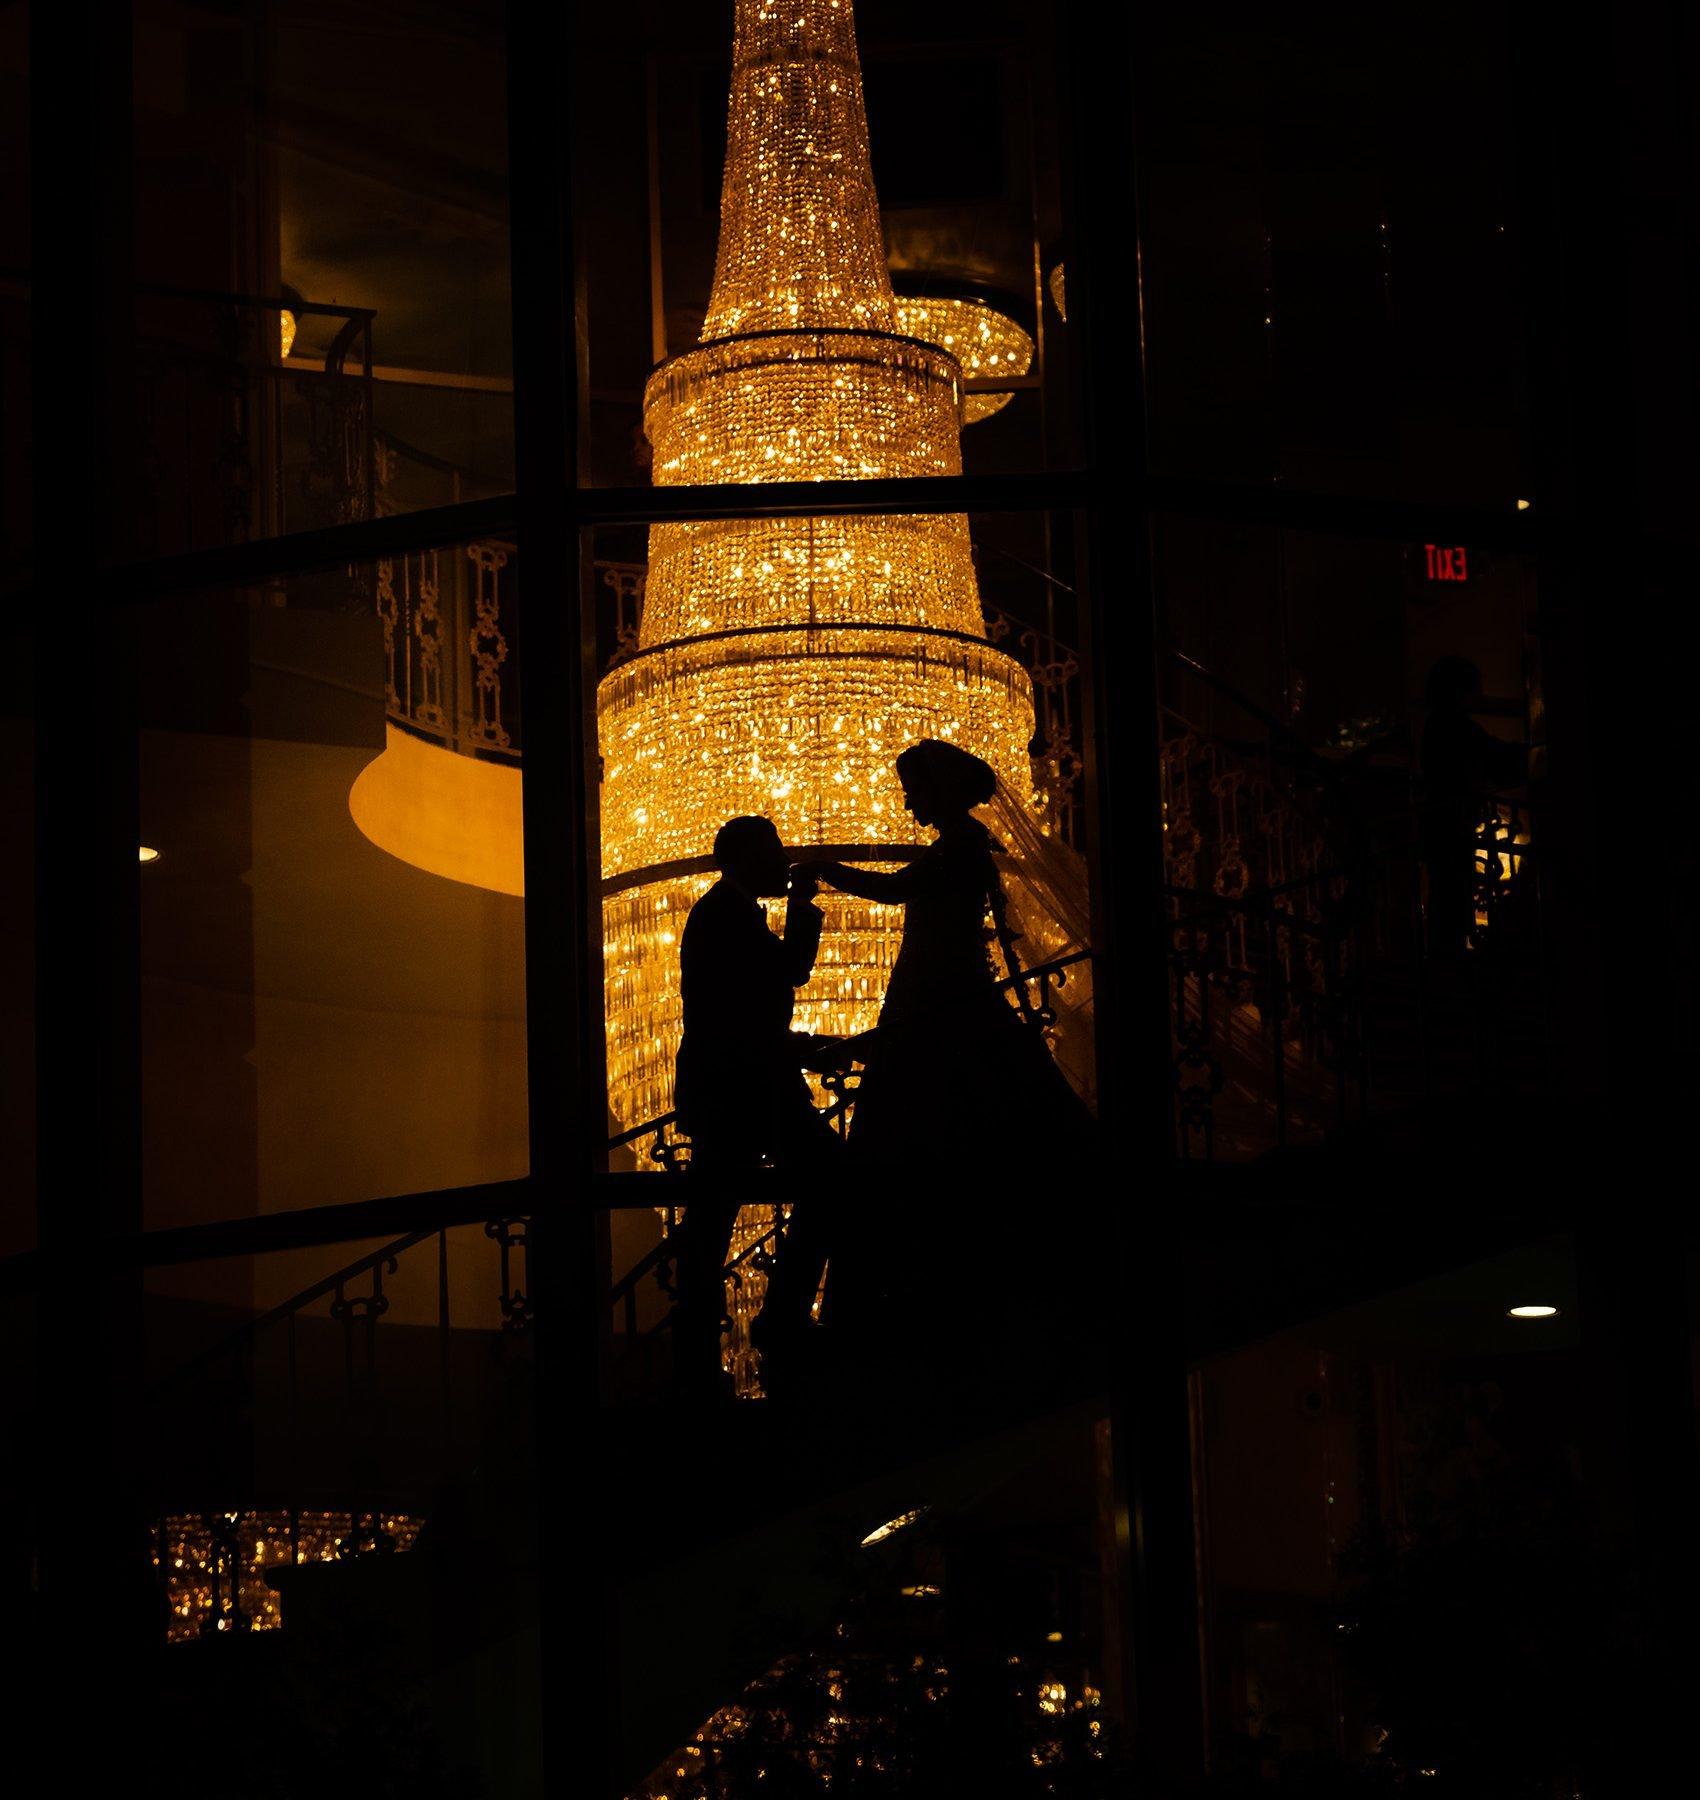 Leonards-Palazzo-Wedding-Photographer-1700x1800 South Asian Weddings